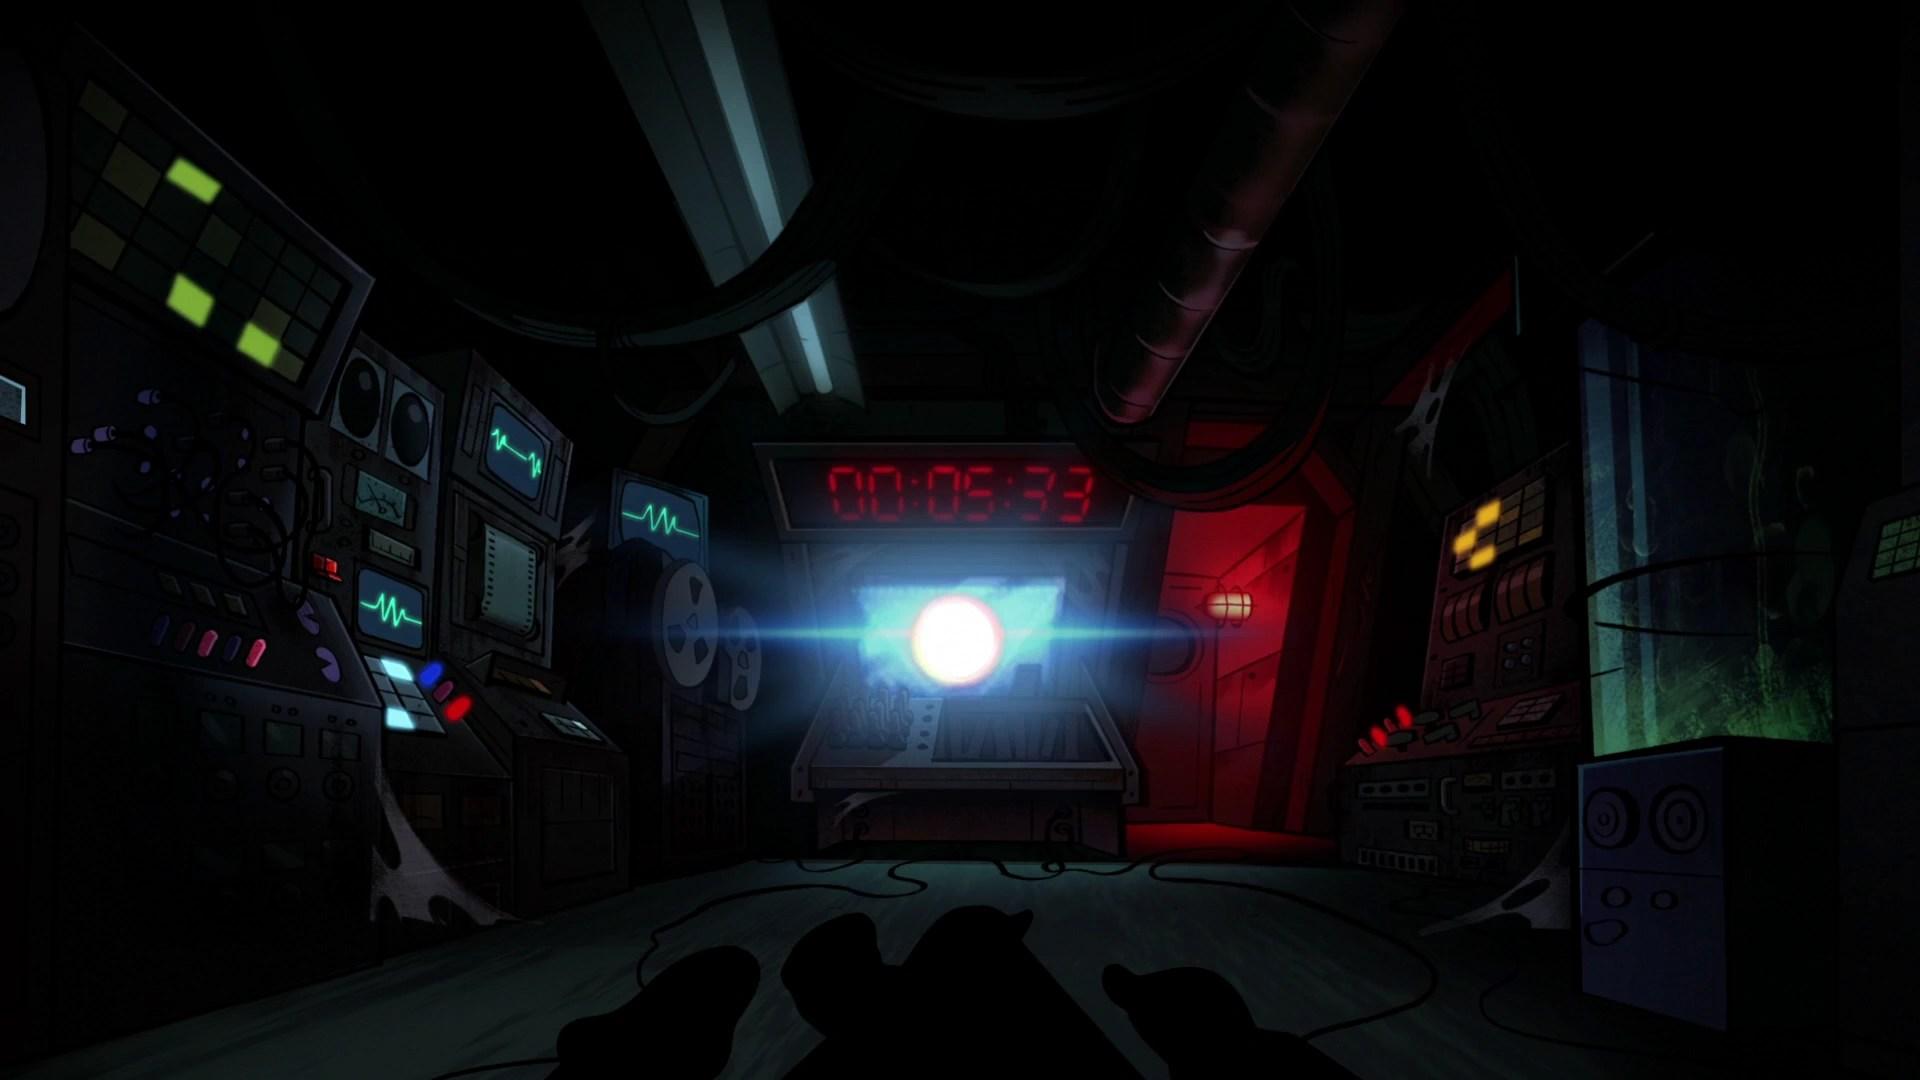 Gravity Falls Mystery Shack Wallpaper Underground Laboratory Disney Wiki Fandom Powered By Wikia